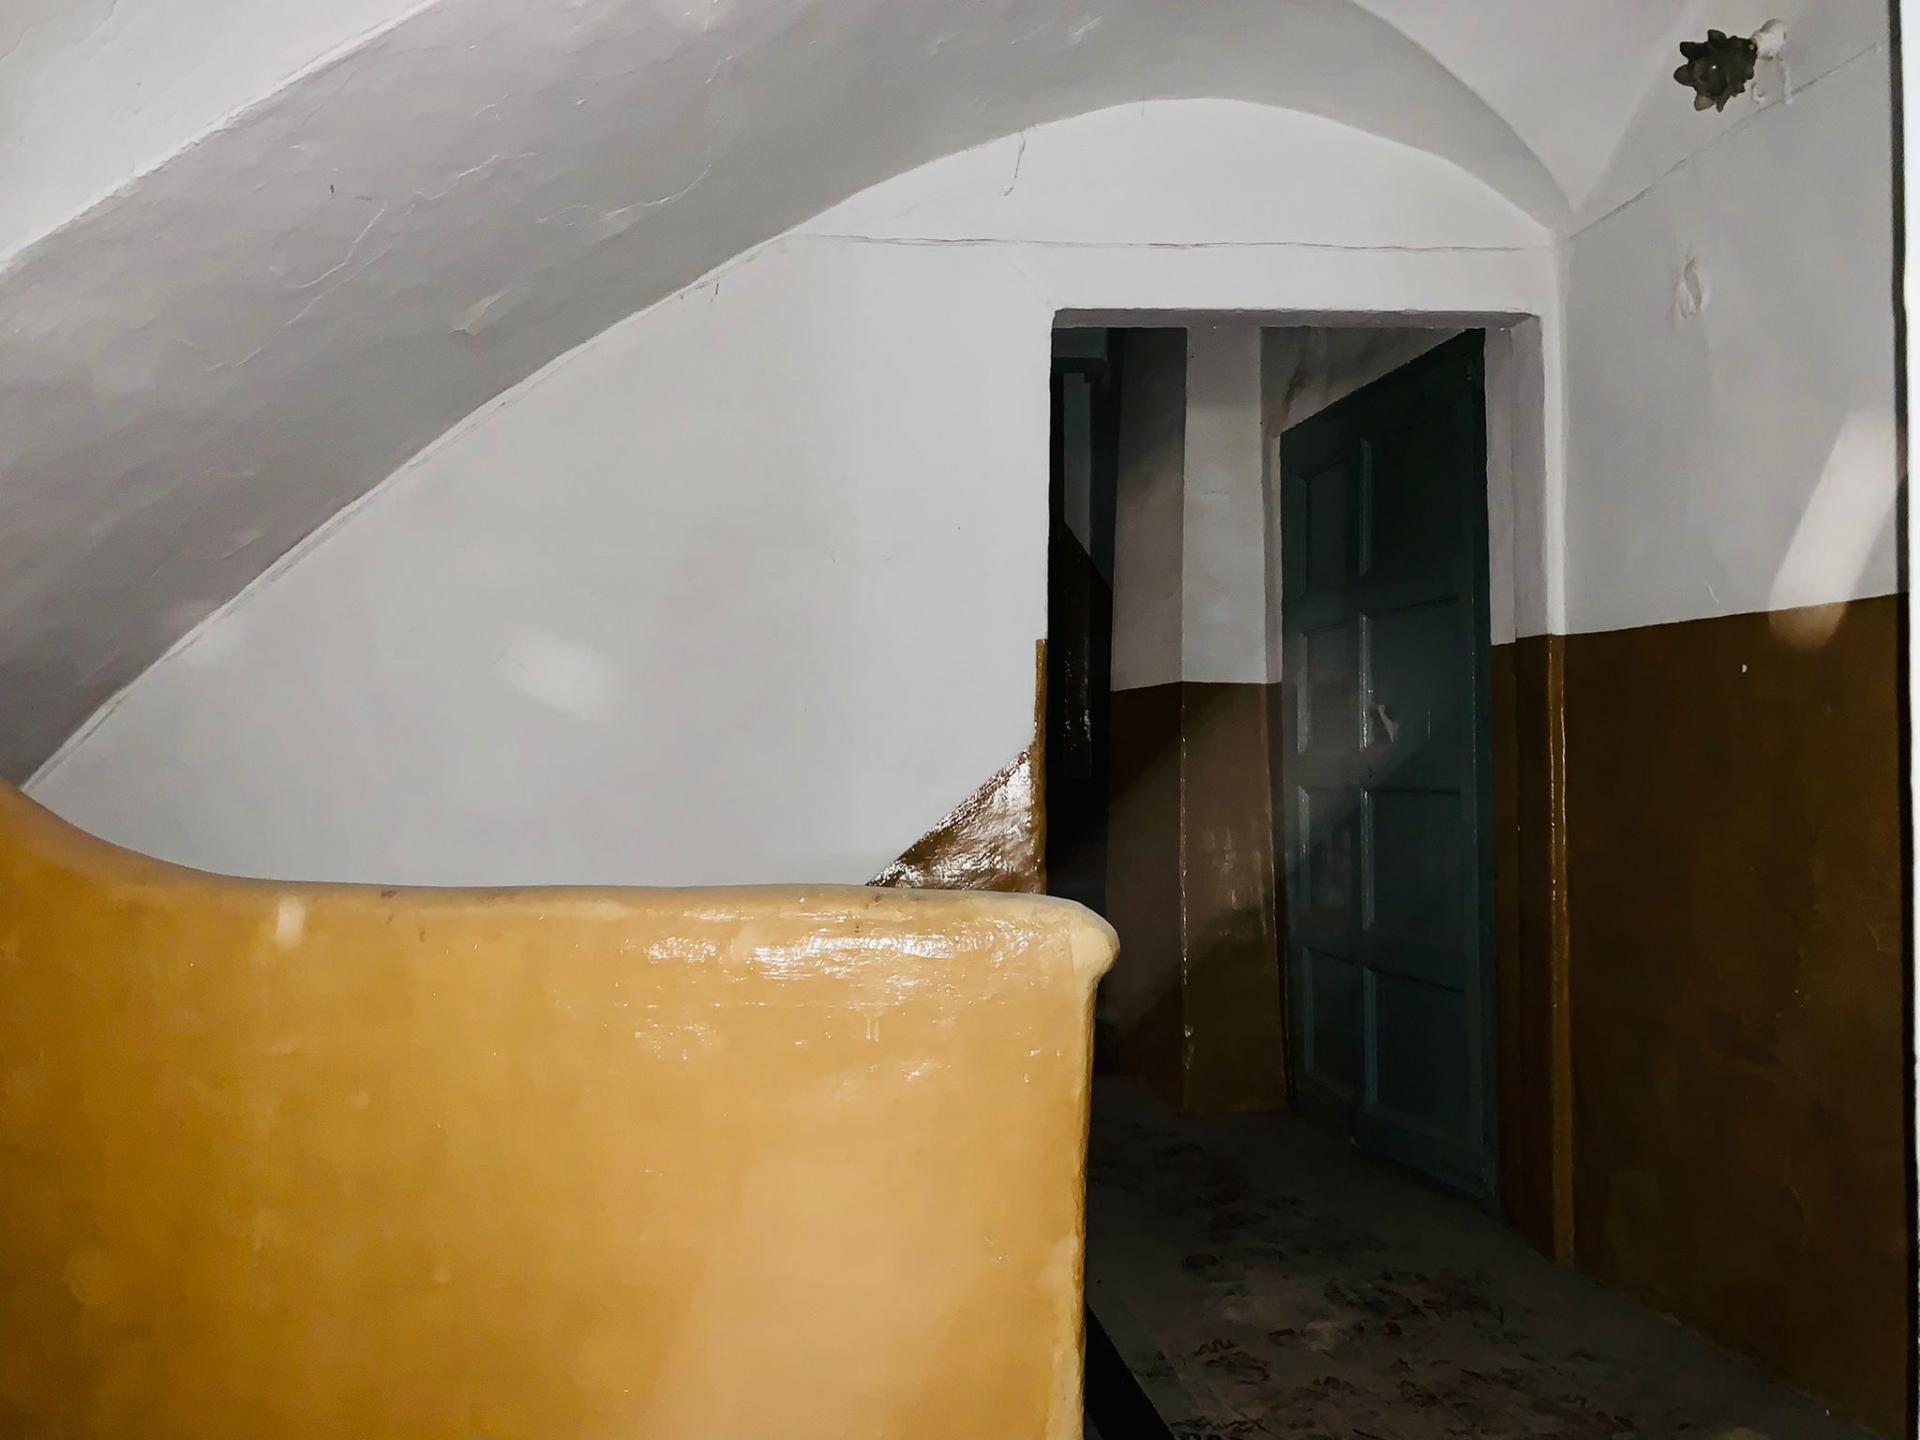 Foto 17 (V-750-2021) - Inmueble en  Venda a Sant Pere de Riudebitlles